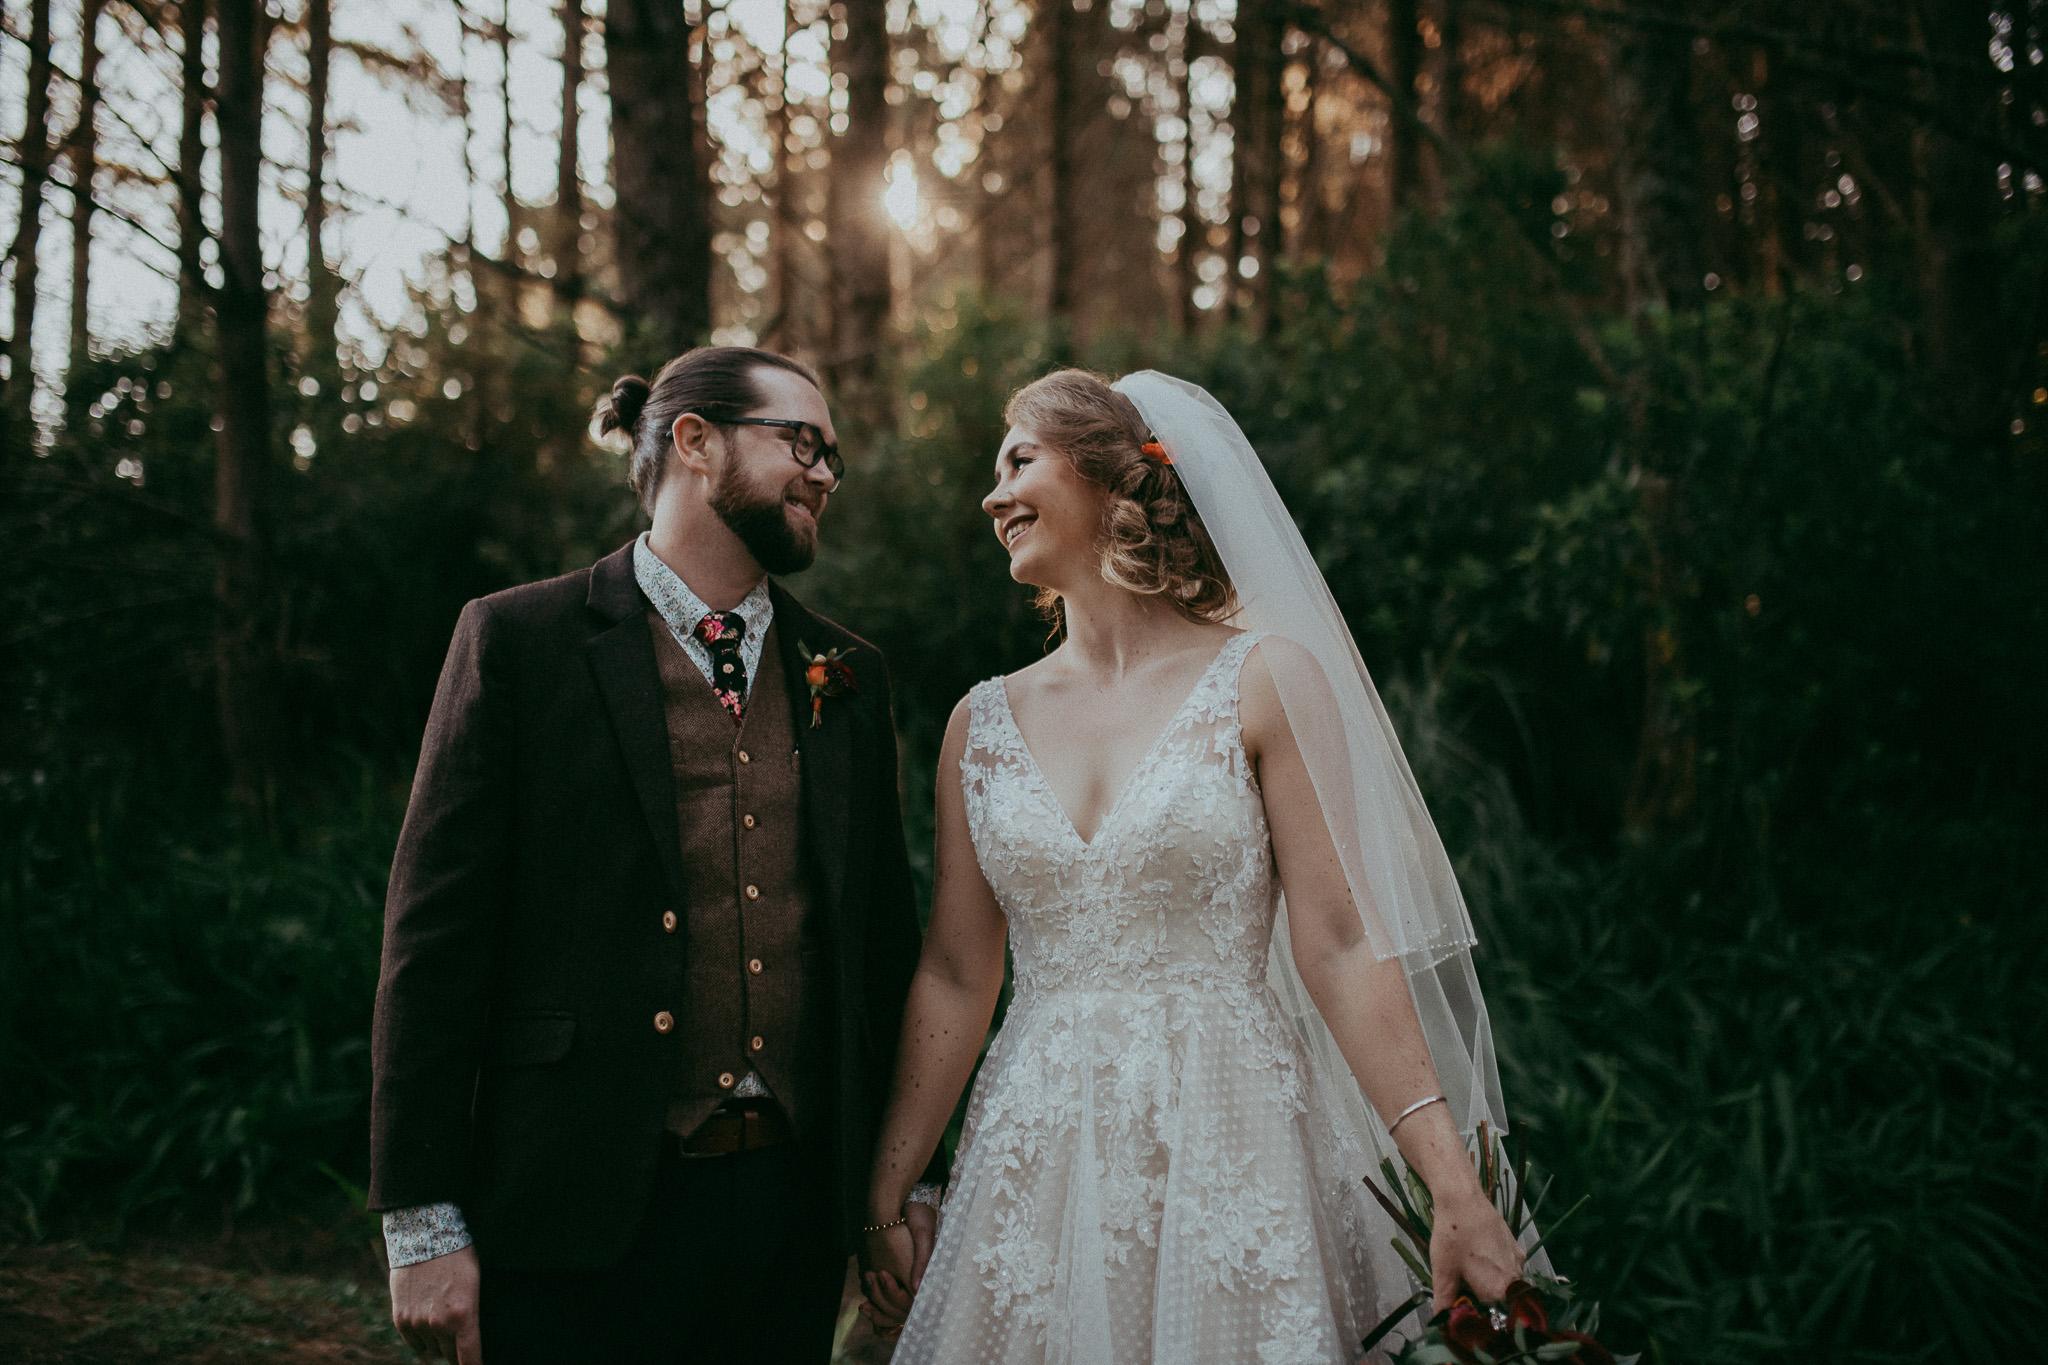 wedding-by-Levien-366.jpg